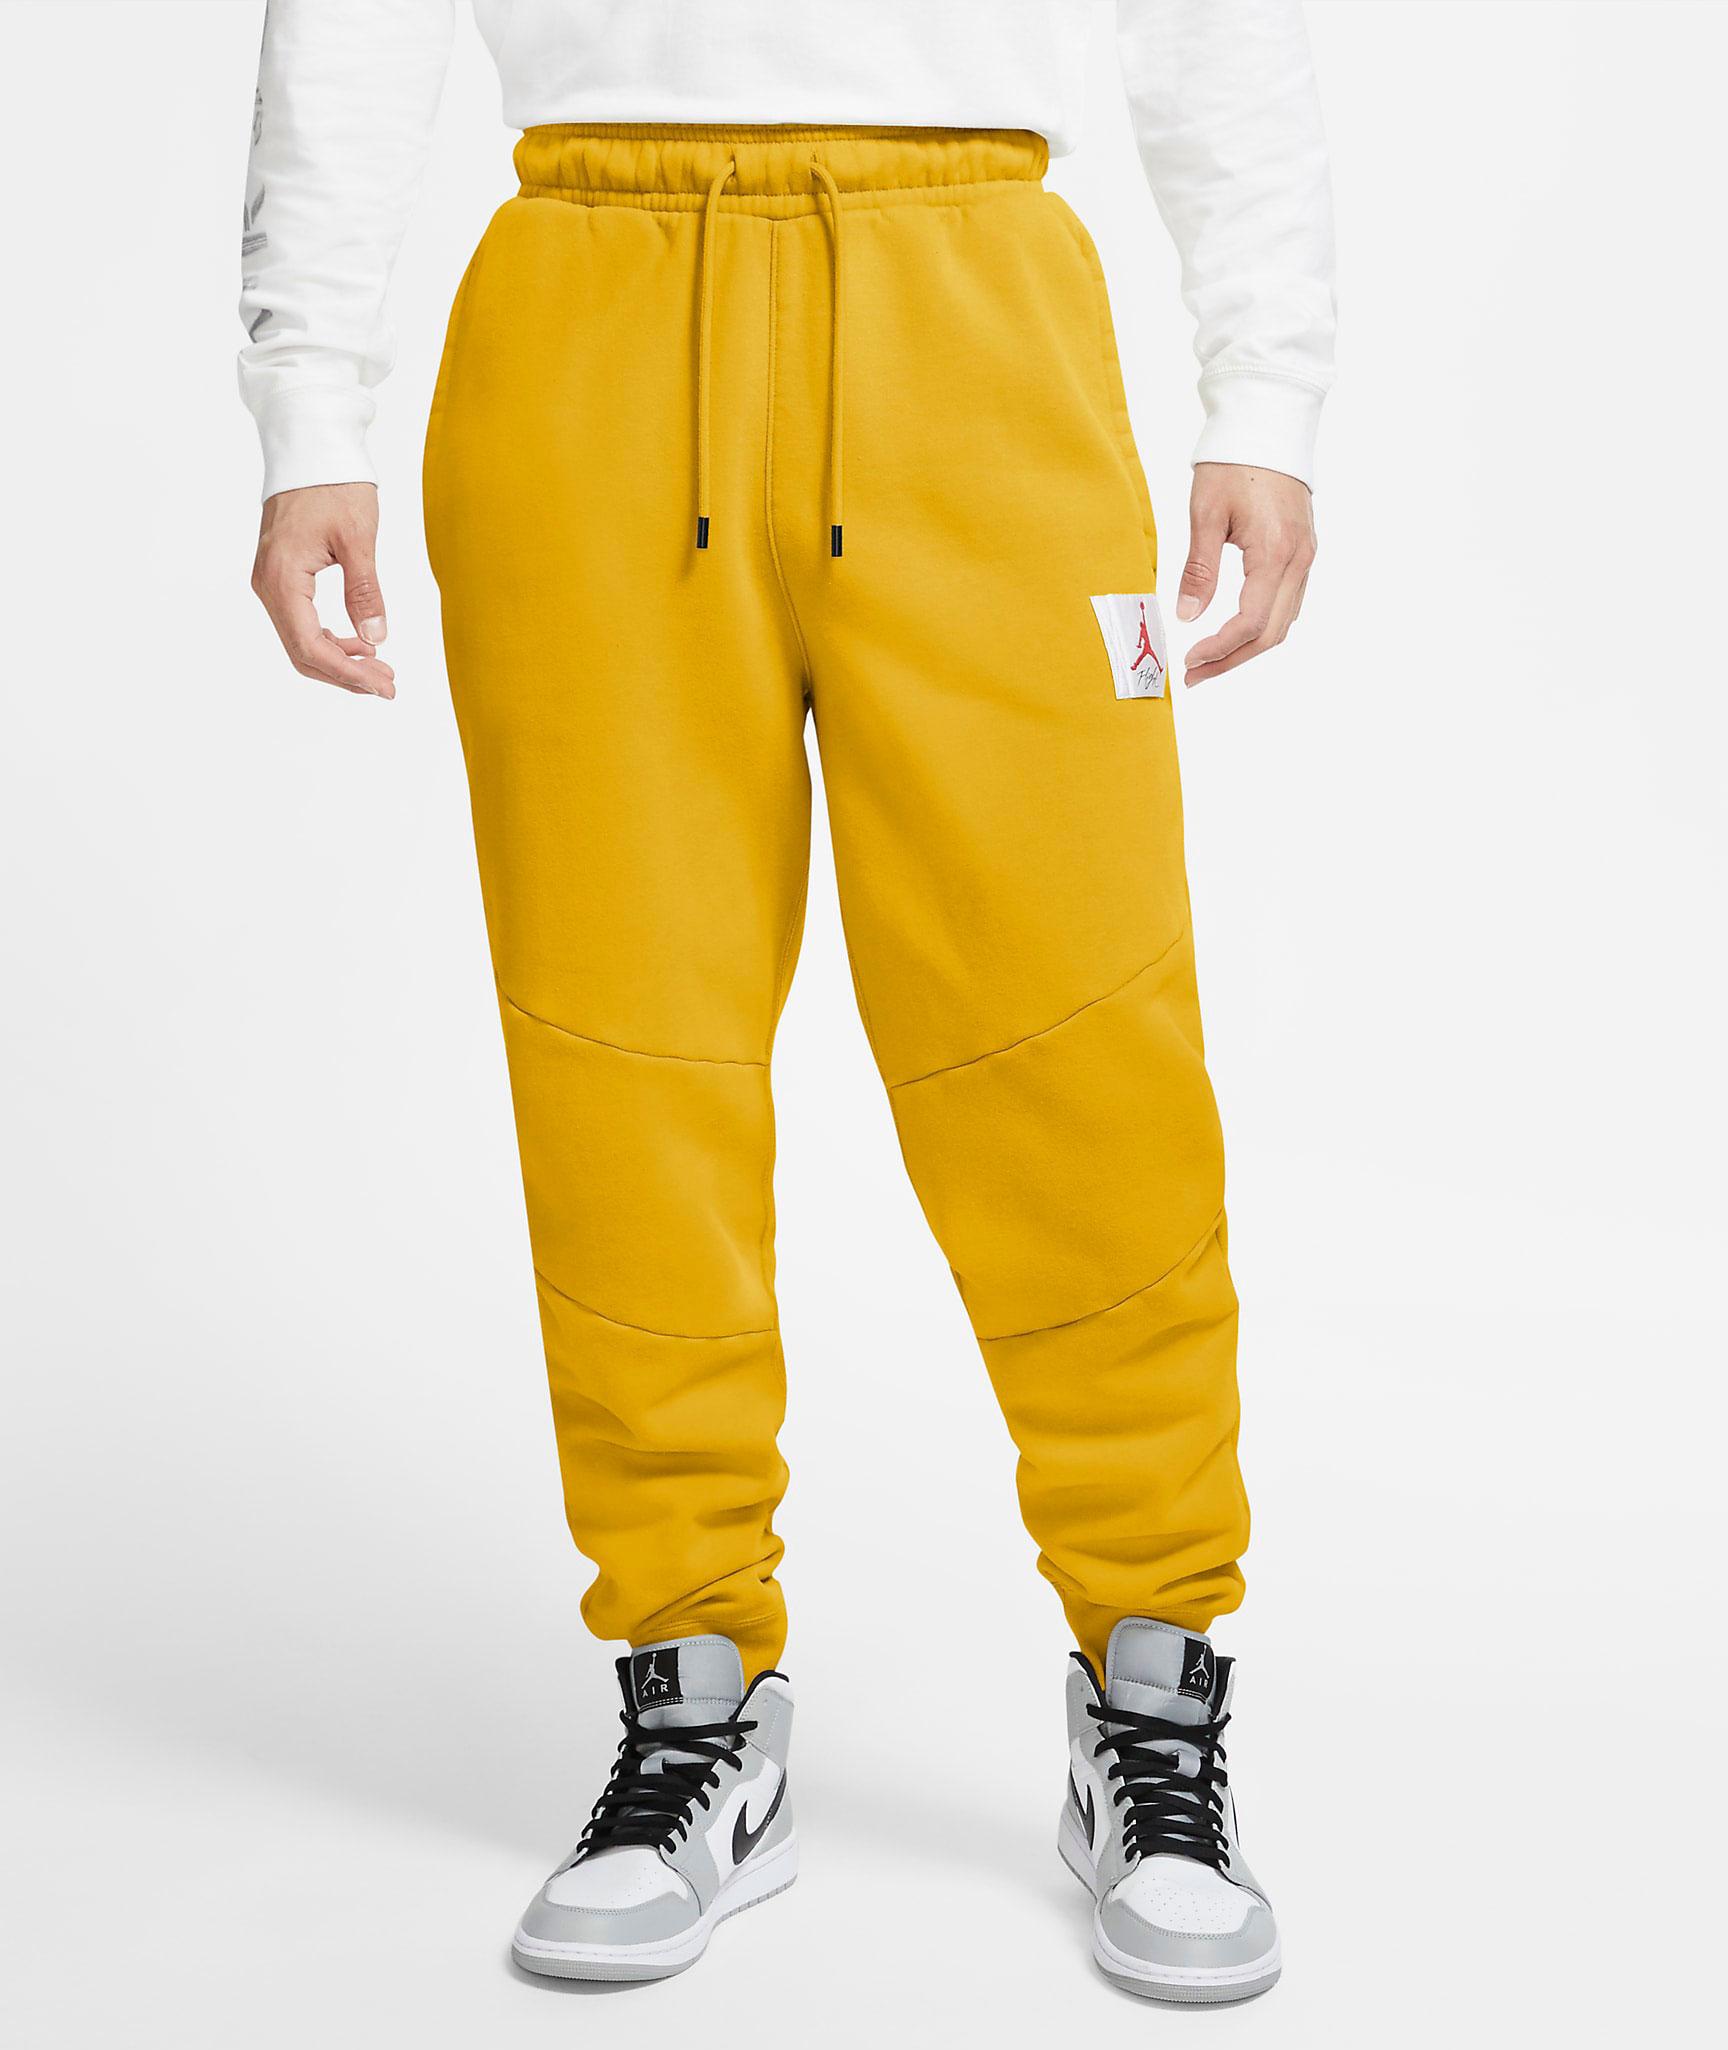 jordan-university-gold-jogger-pants